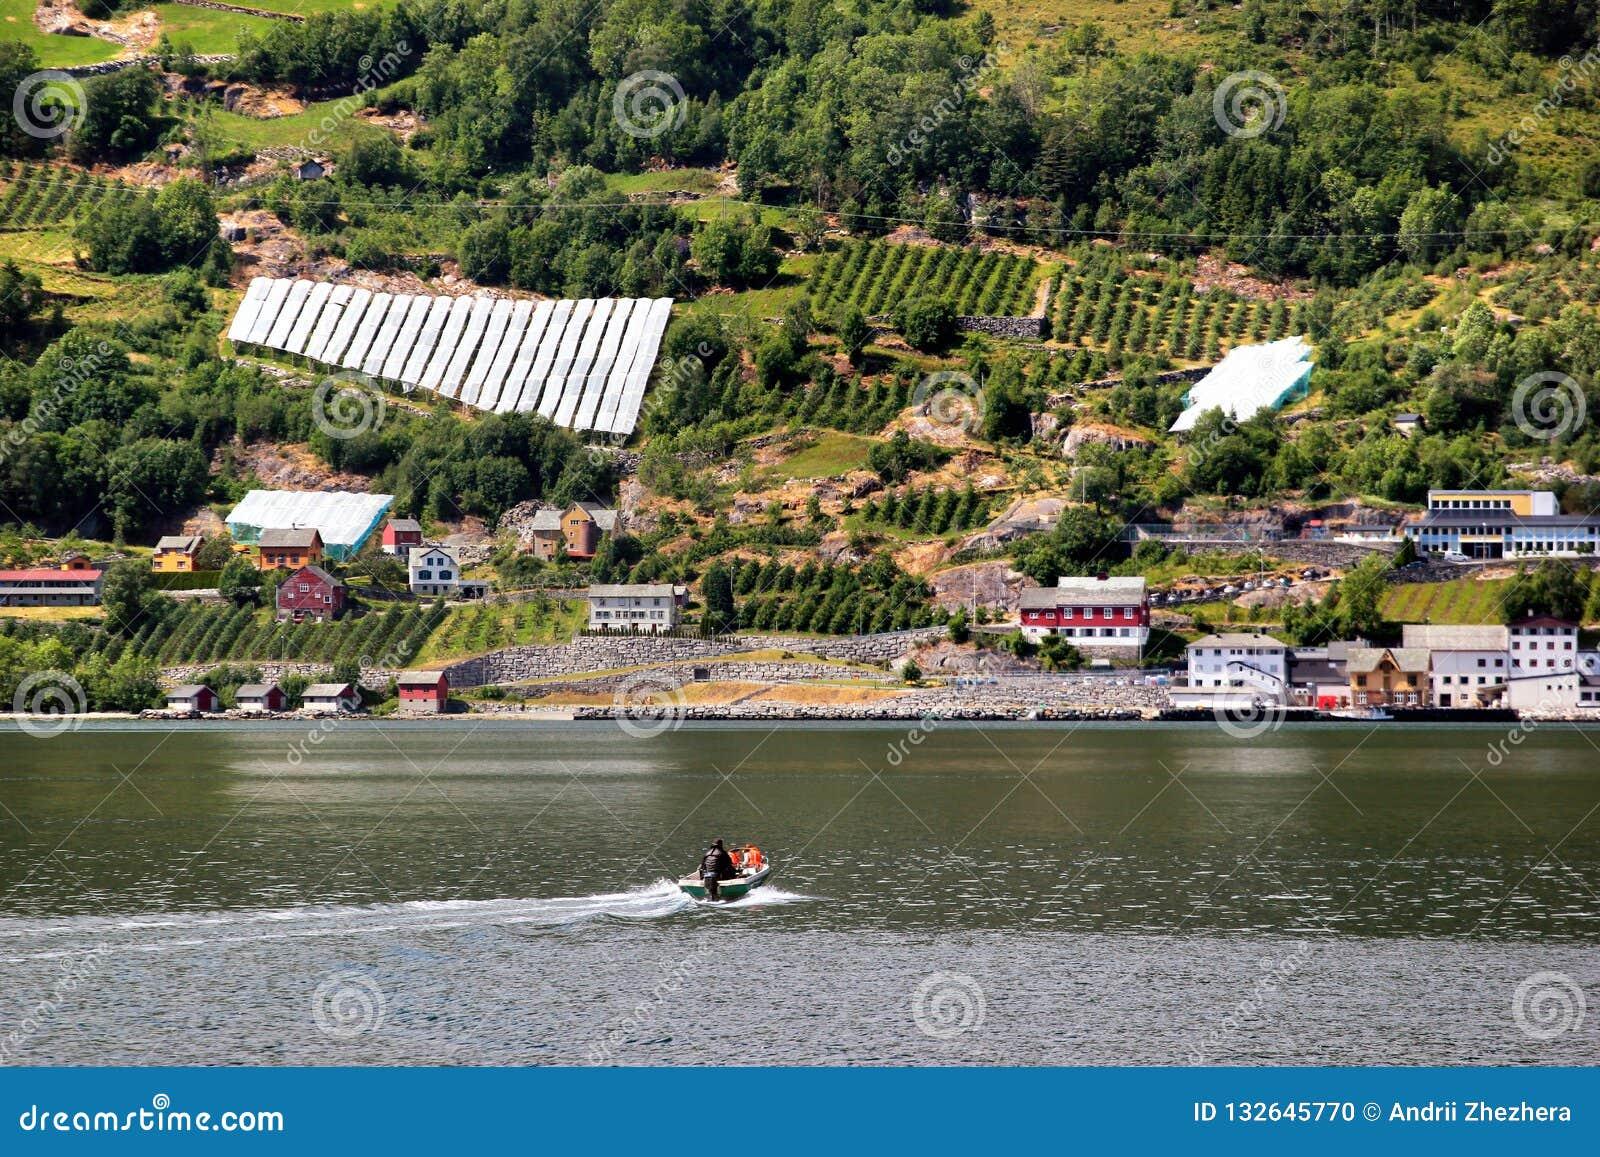 Fruit gardens on coasts of the Hardanger fjord, Hordaland county, Norway